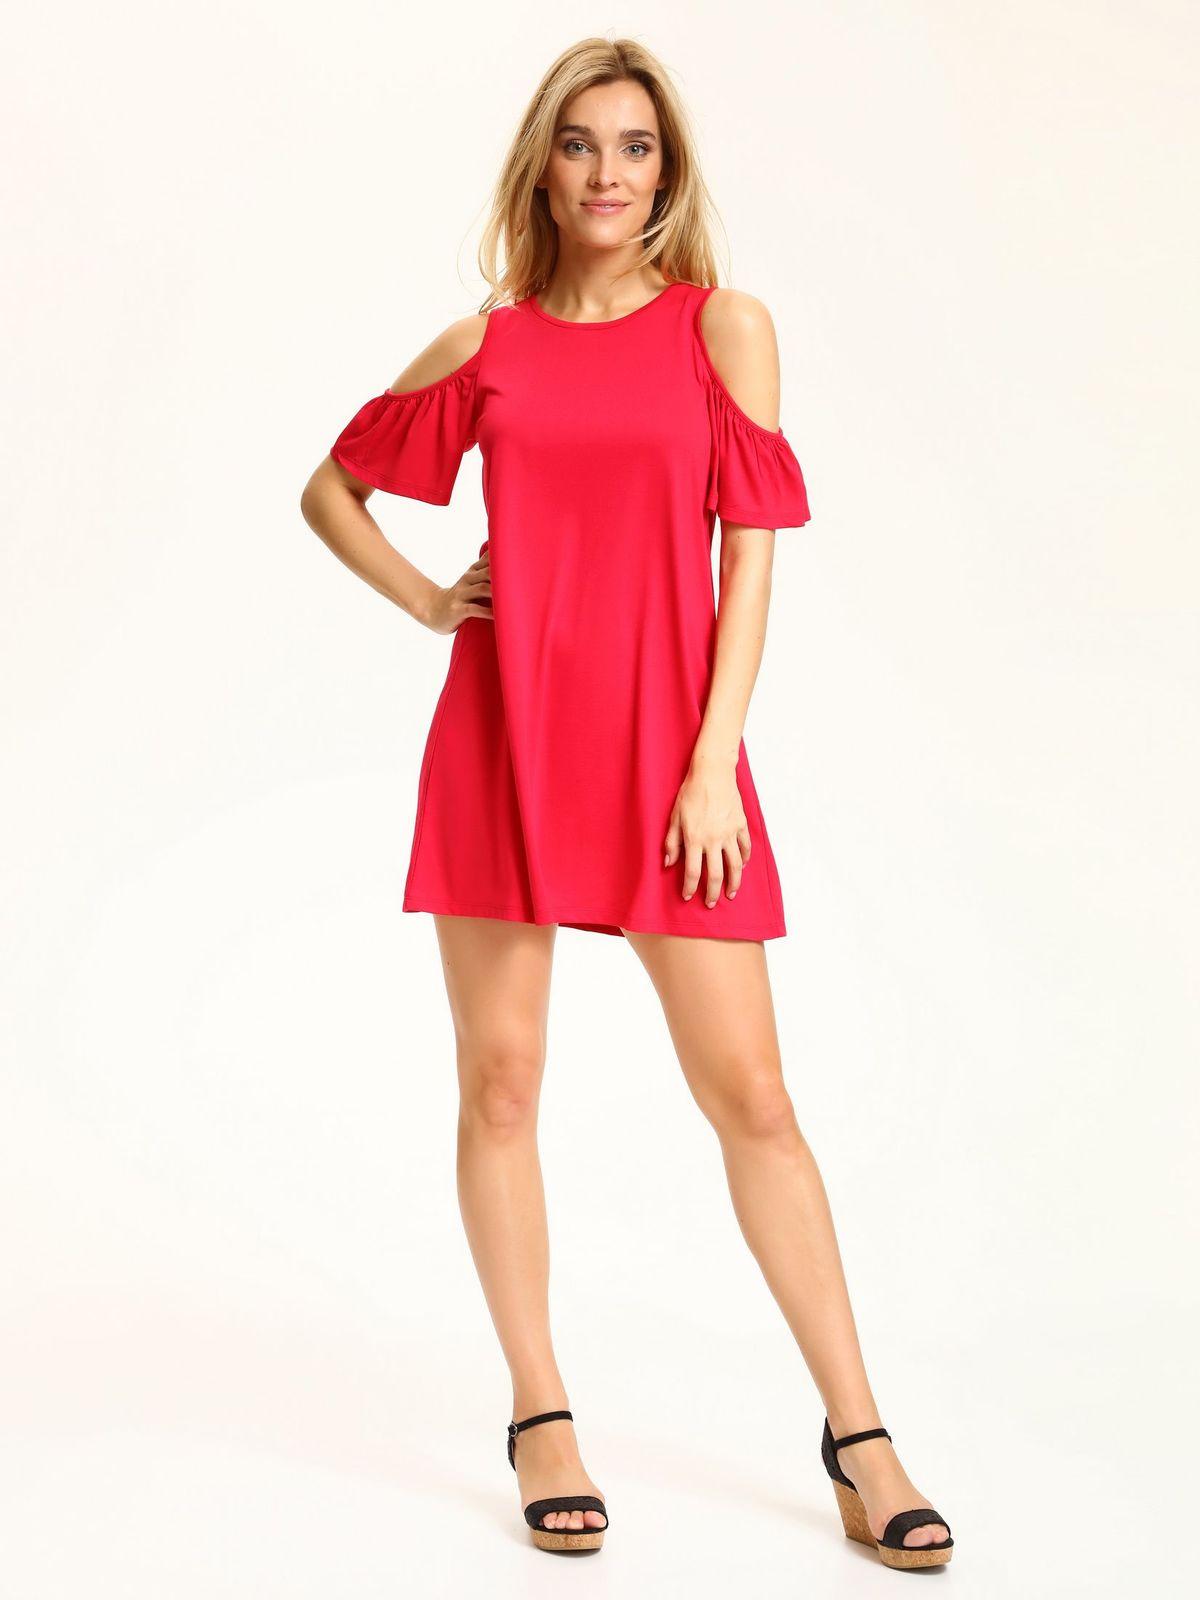 574dfffbf683 TOP SECRET top secret off… Styleiconboutique. Γυναικείο φόρεμα off shoulder  ...